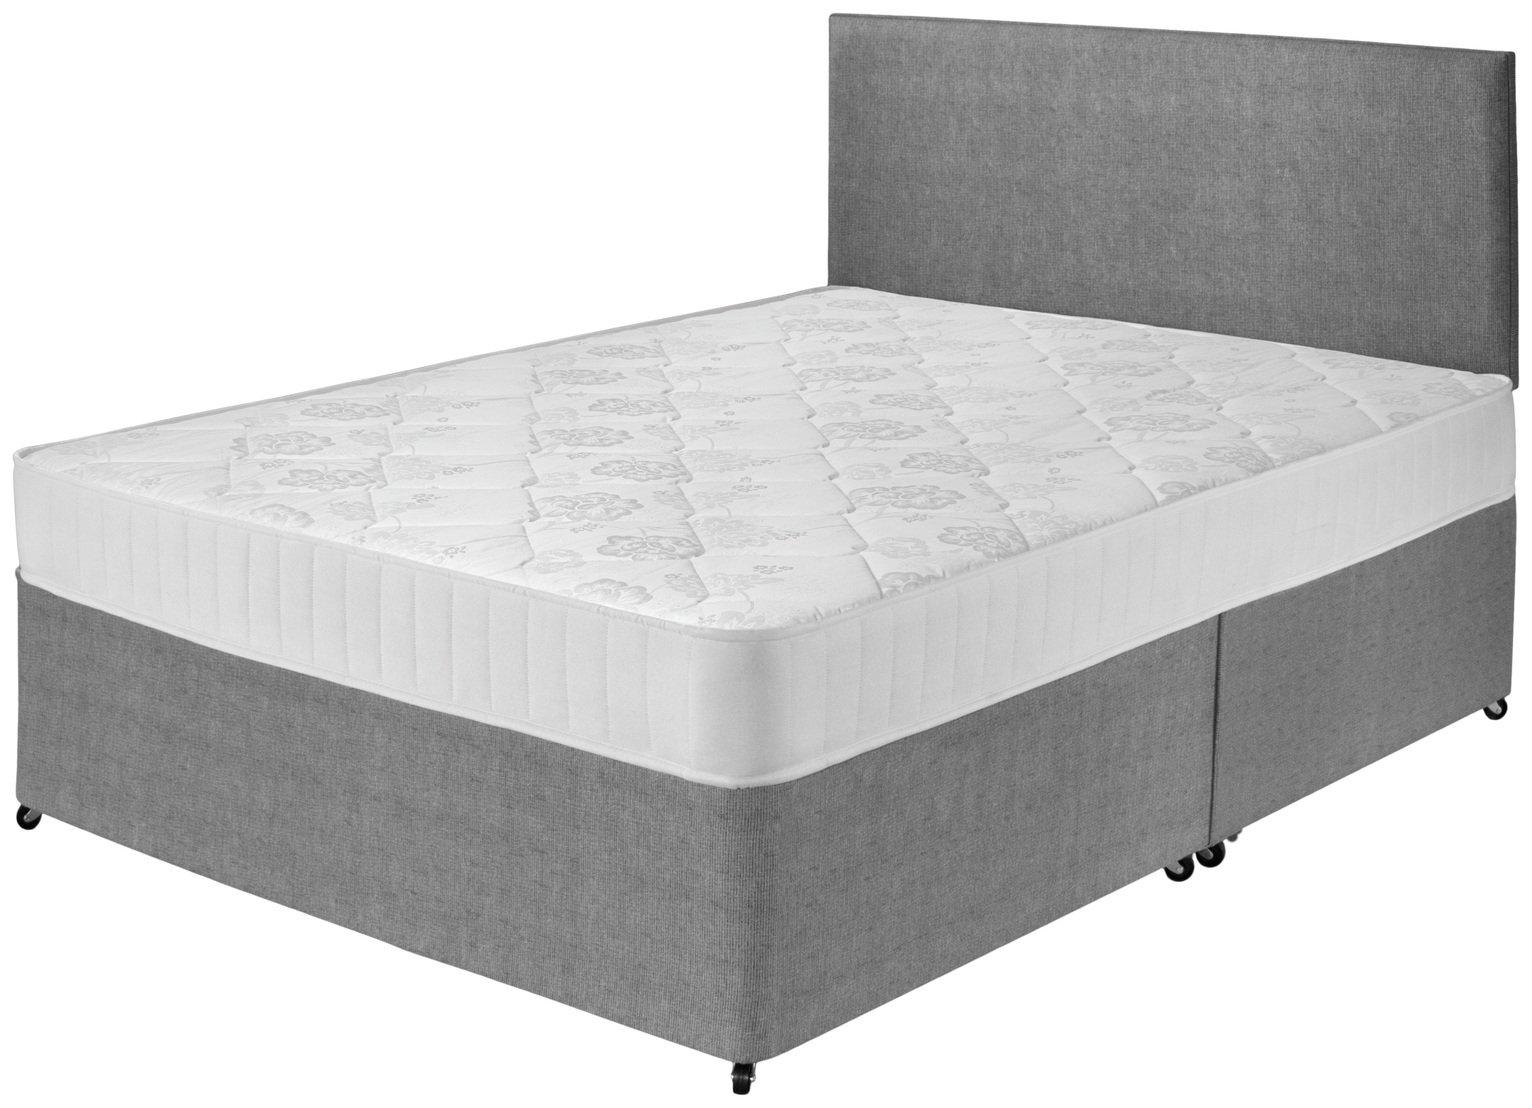 Airsprung Elmdon Comfort Divan Bed - Kingsize